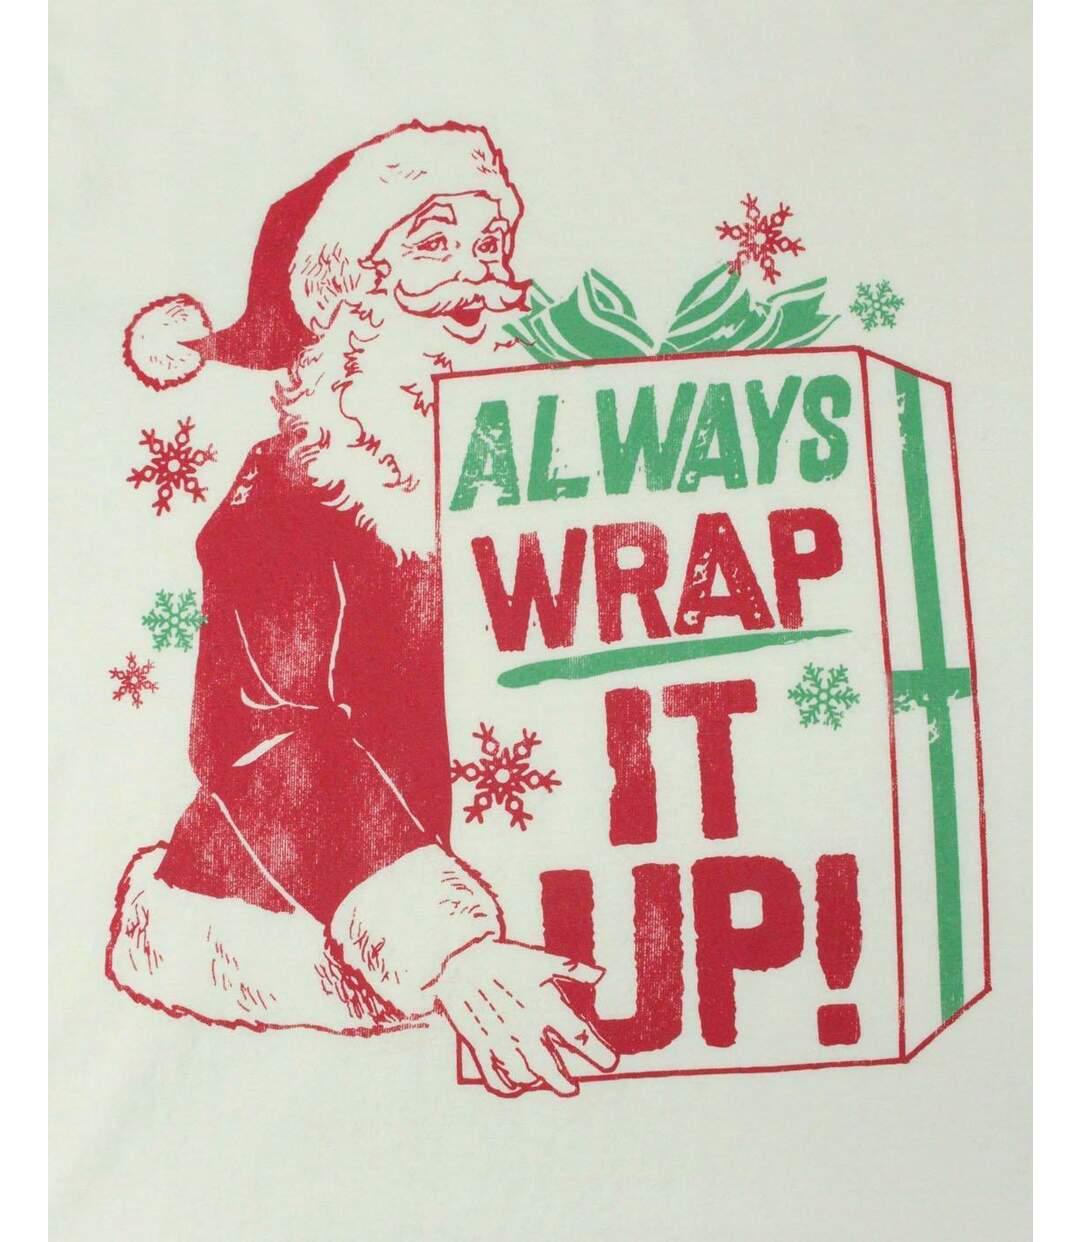 Junk Food Mens Always Wrap It Up Santa Claus T-Shirt (Ivory/Green/Red) - UTNS5523